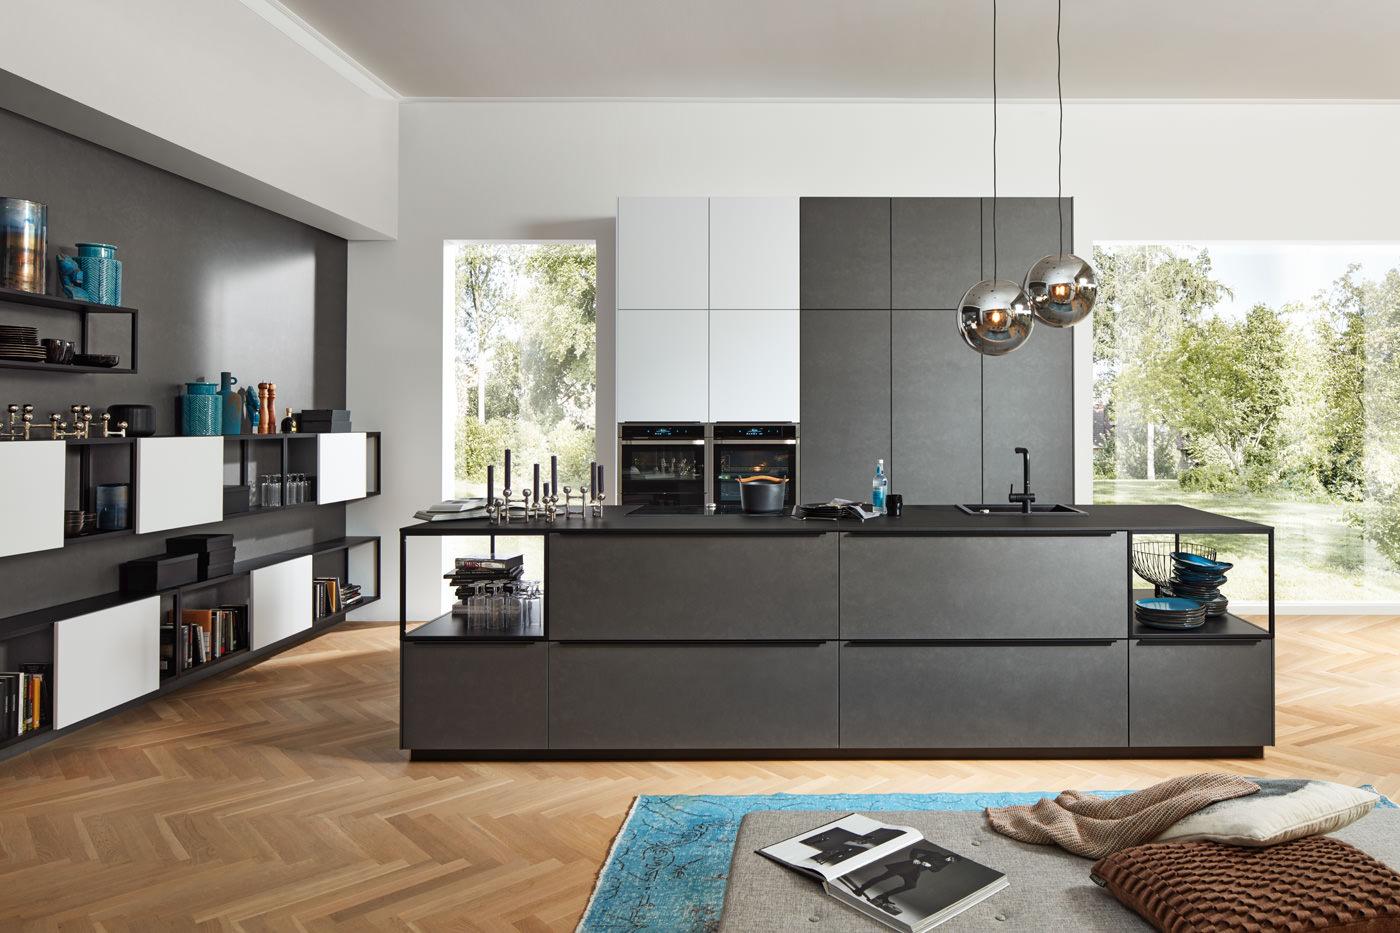 Moderne keuken met donkere elementen